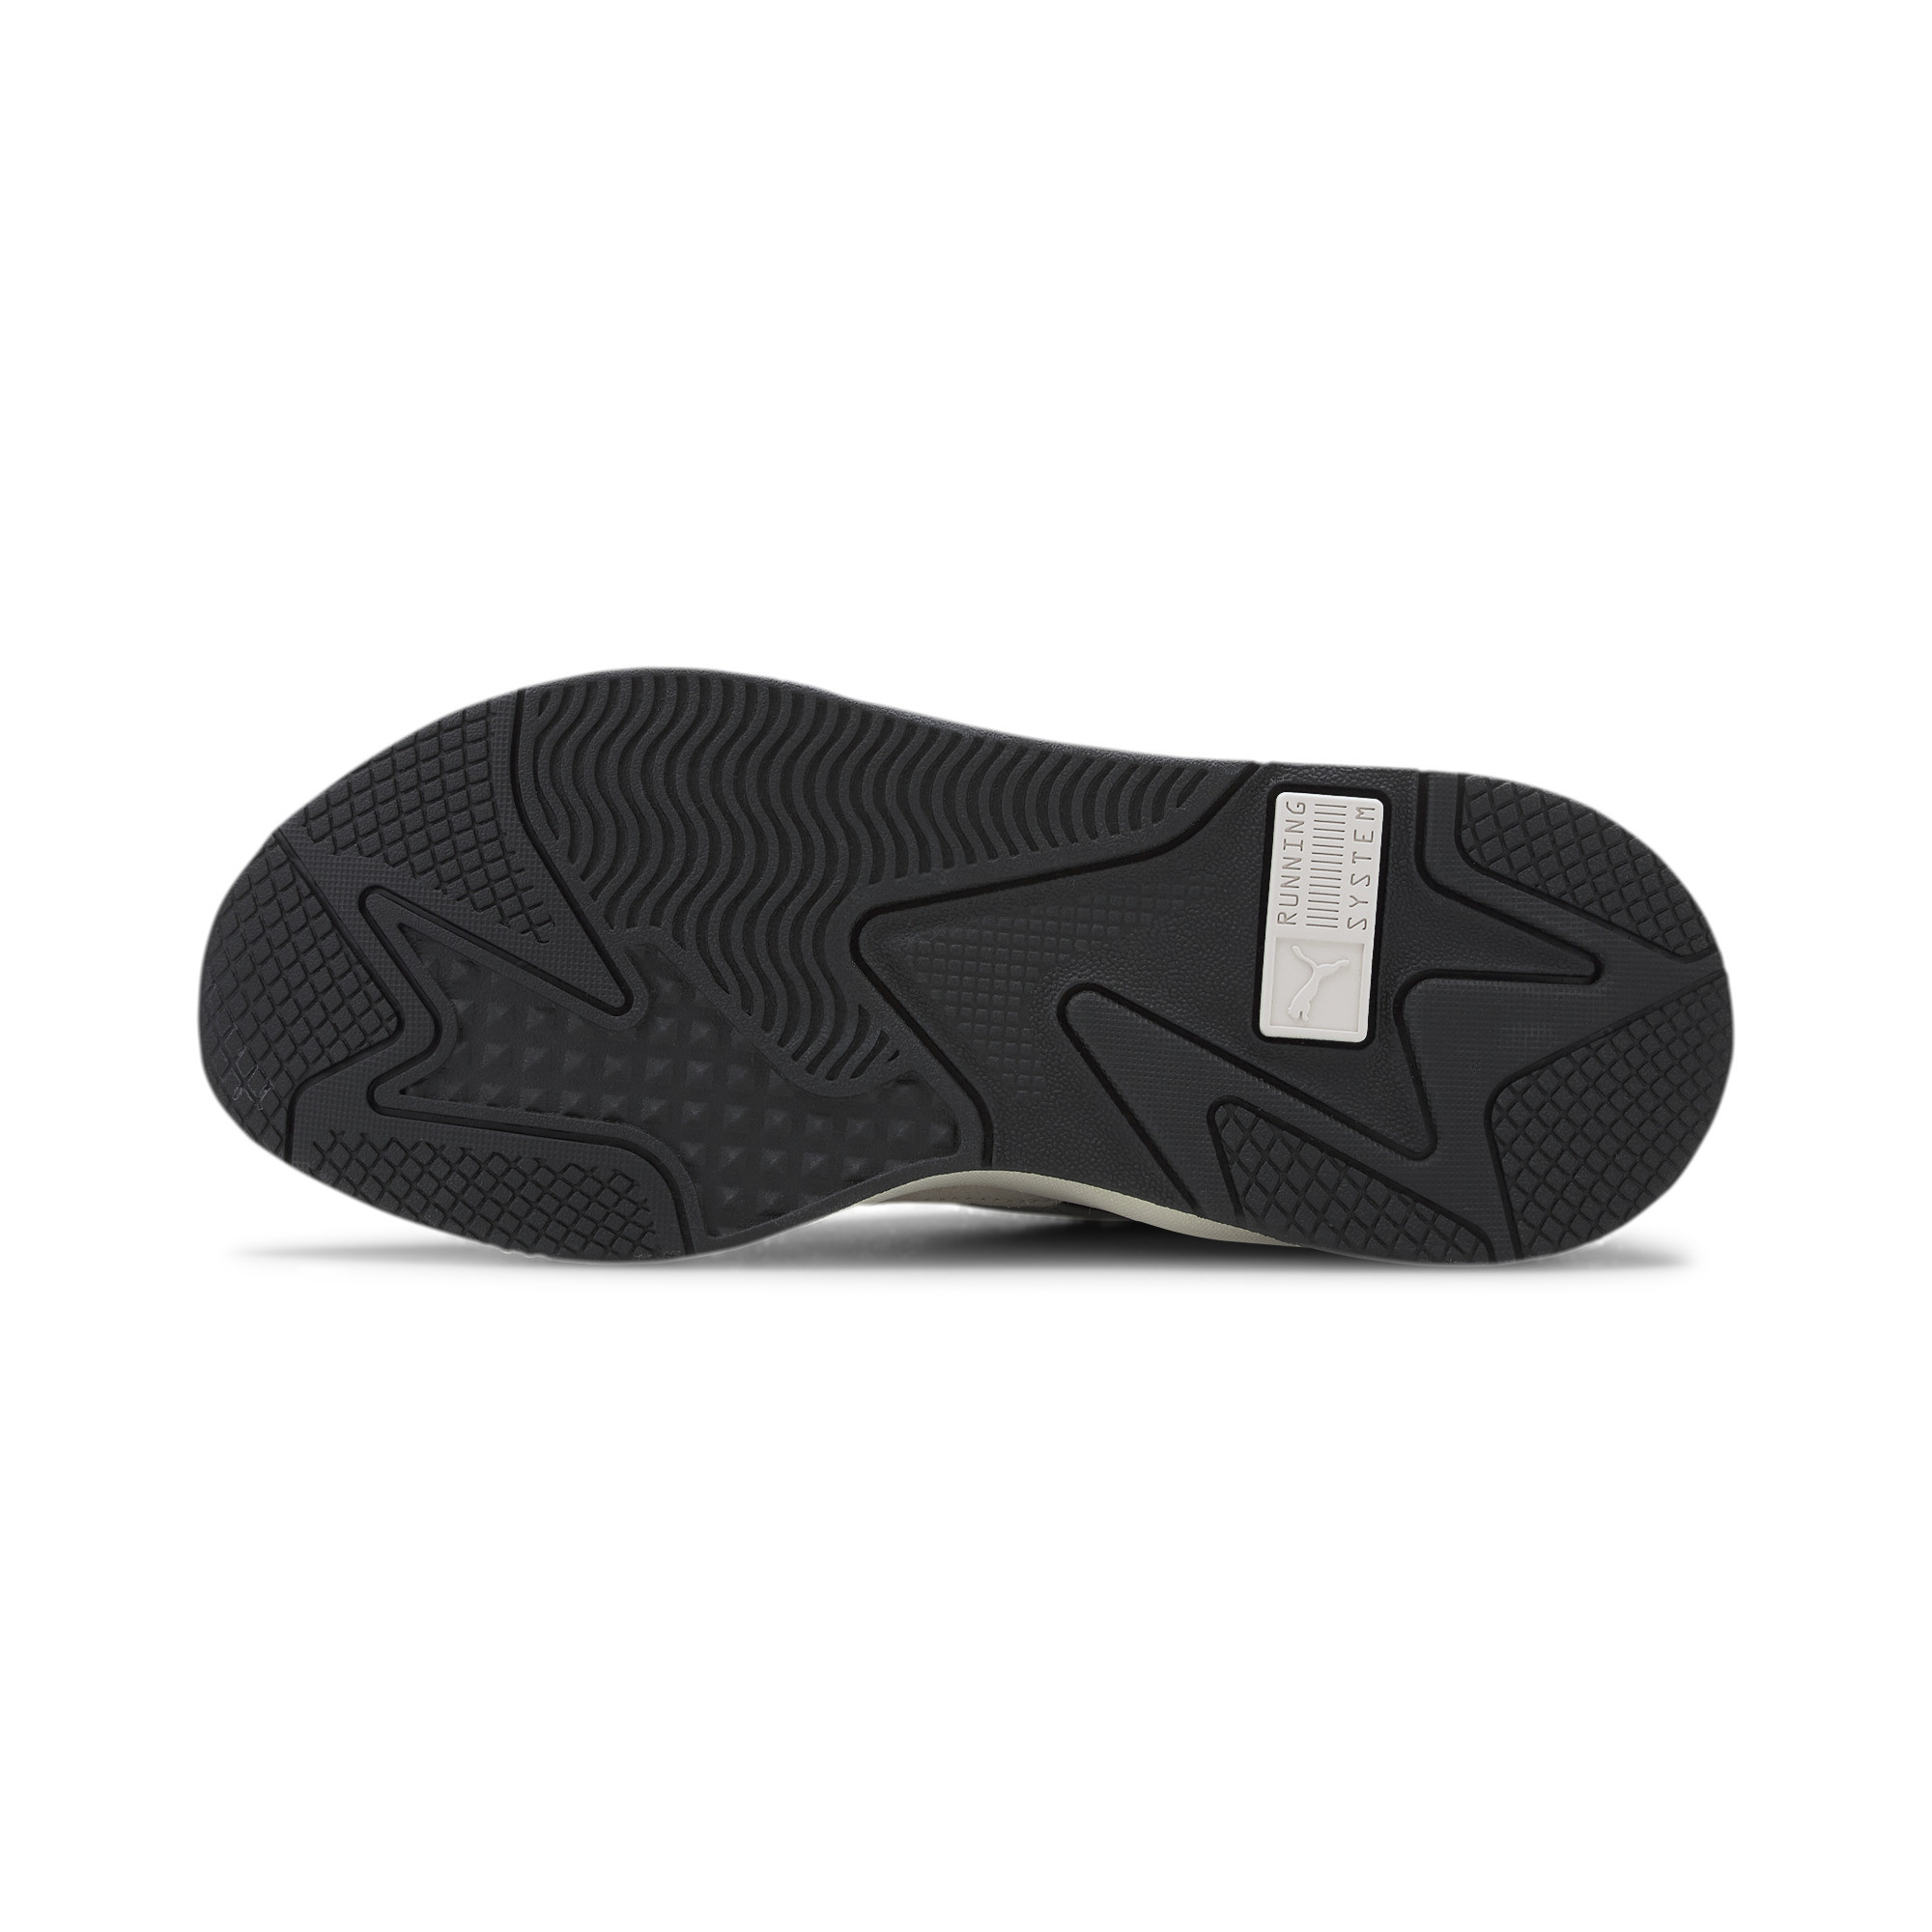 PUMA-Men-039-s-RS-X-Puzzle-Sneakers thumbnail 12